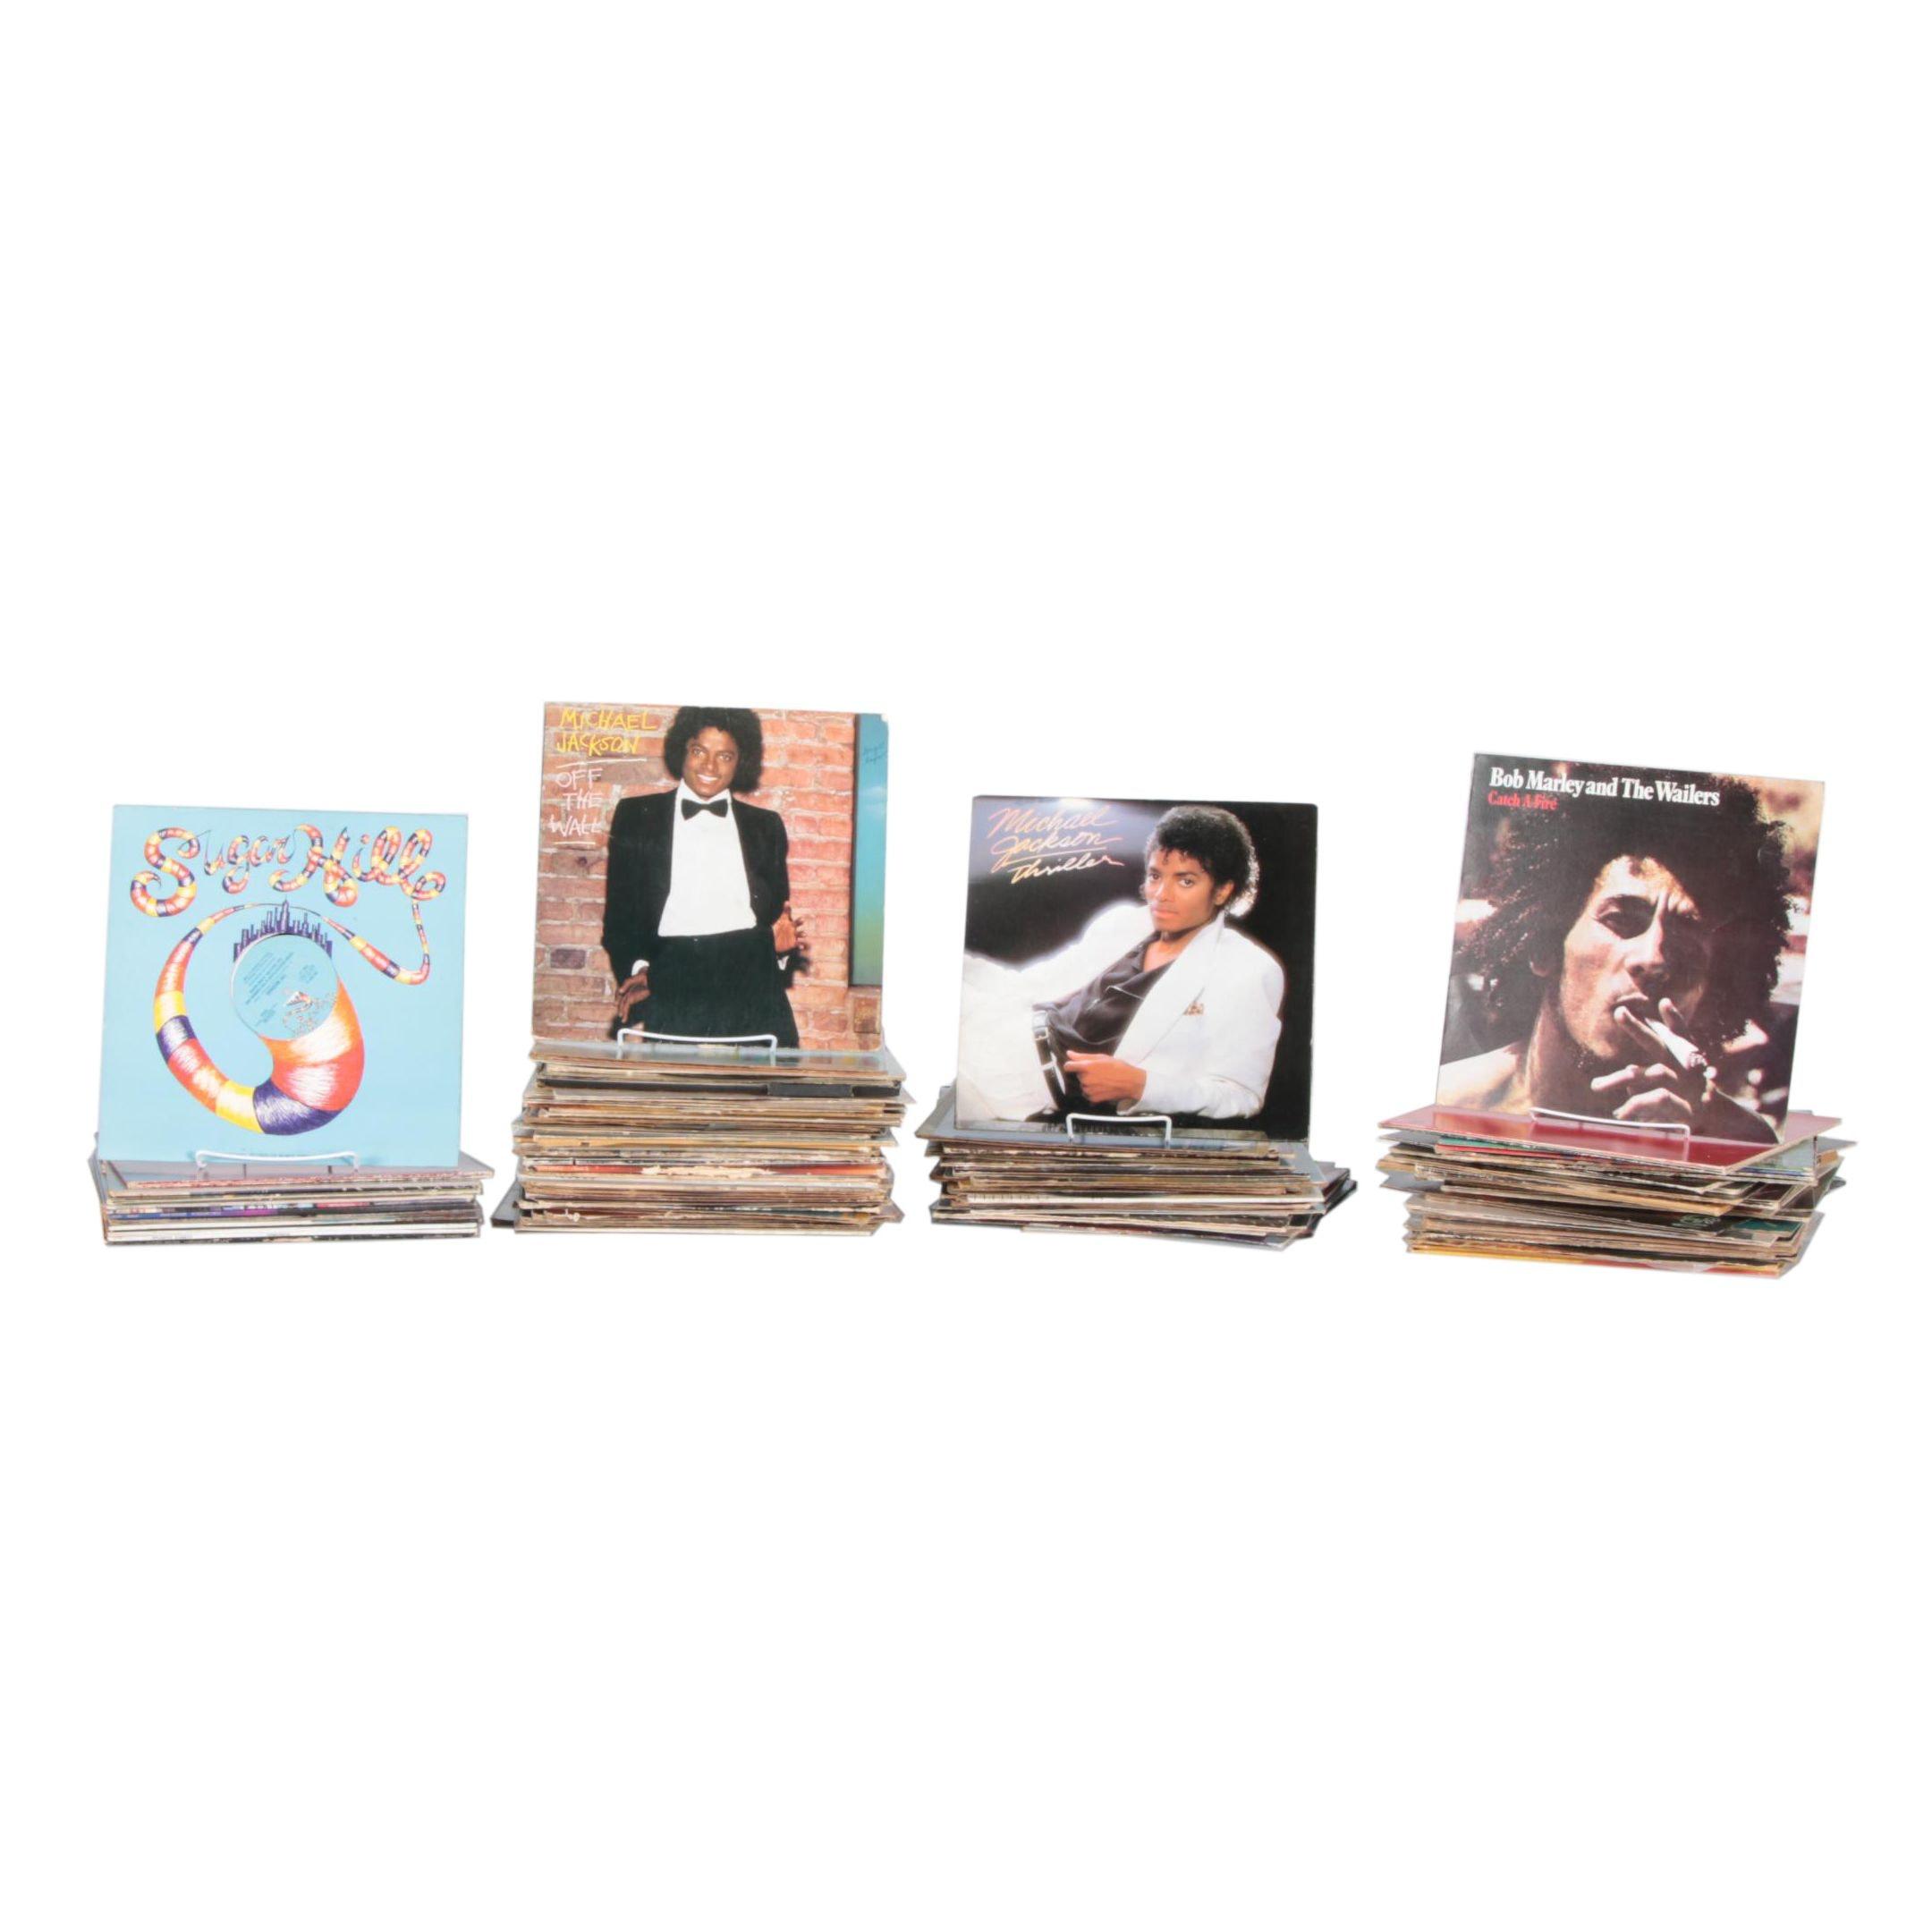 Michael Jackson, Bob Marley, Paul McCartney, Other Rock/Pop LPs